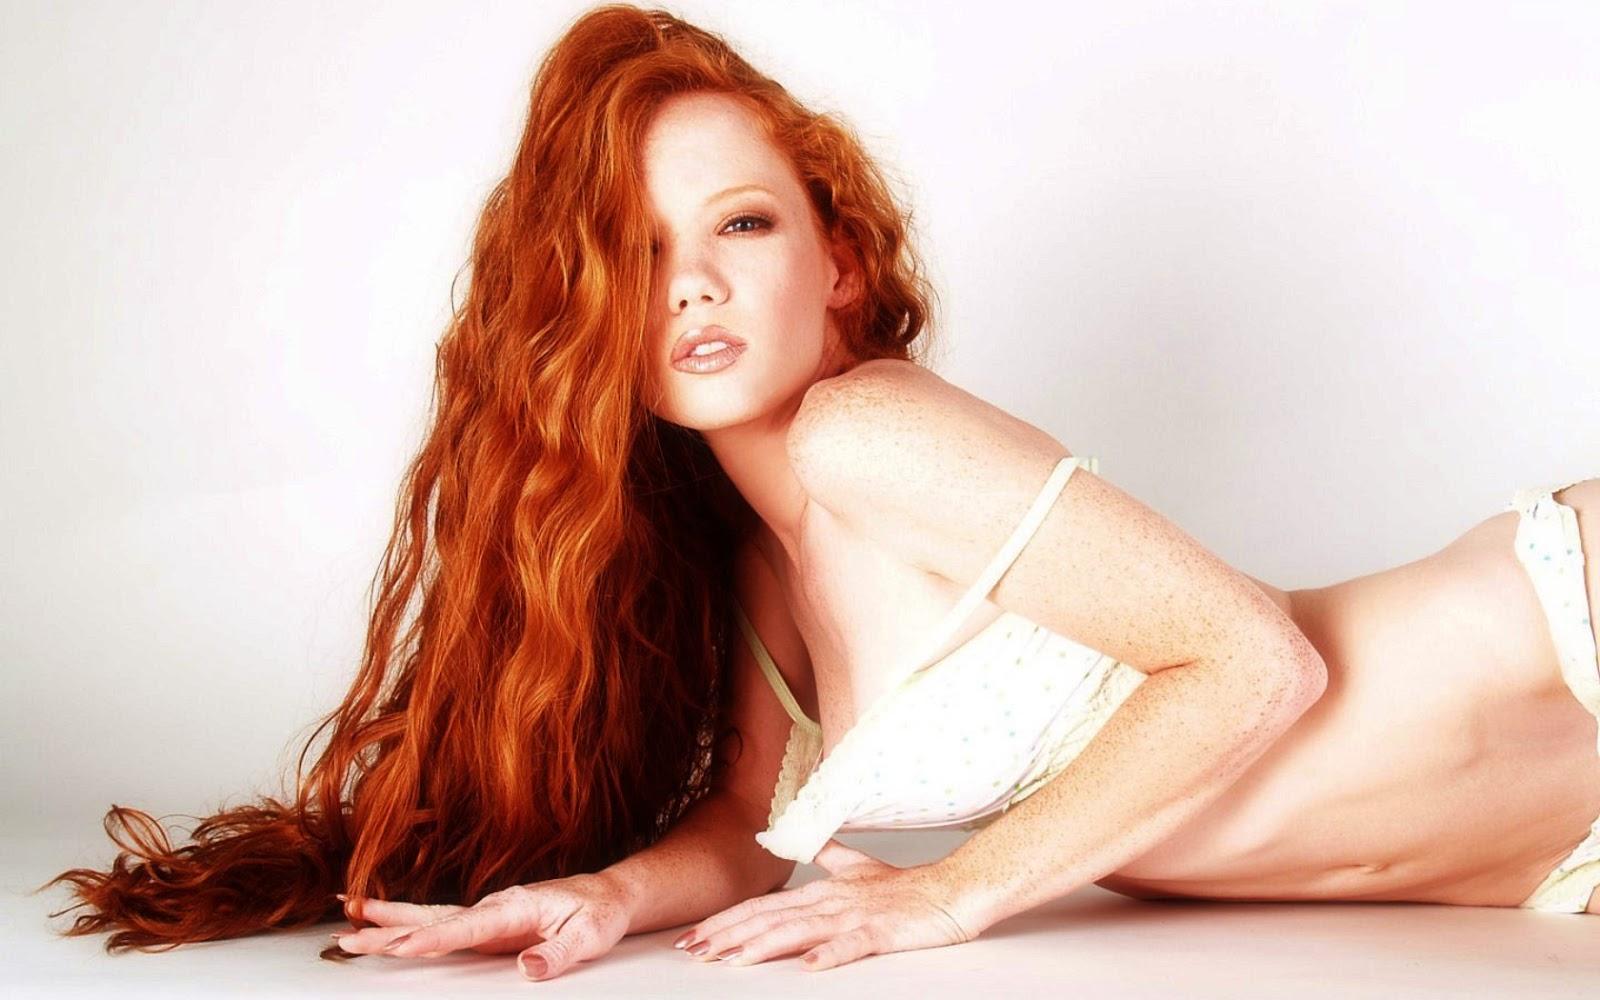 Irish Girl With Long Red Hair Hot Girls Wallpaper